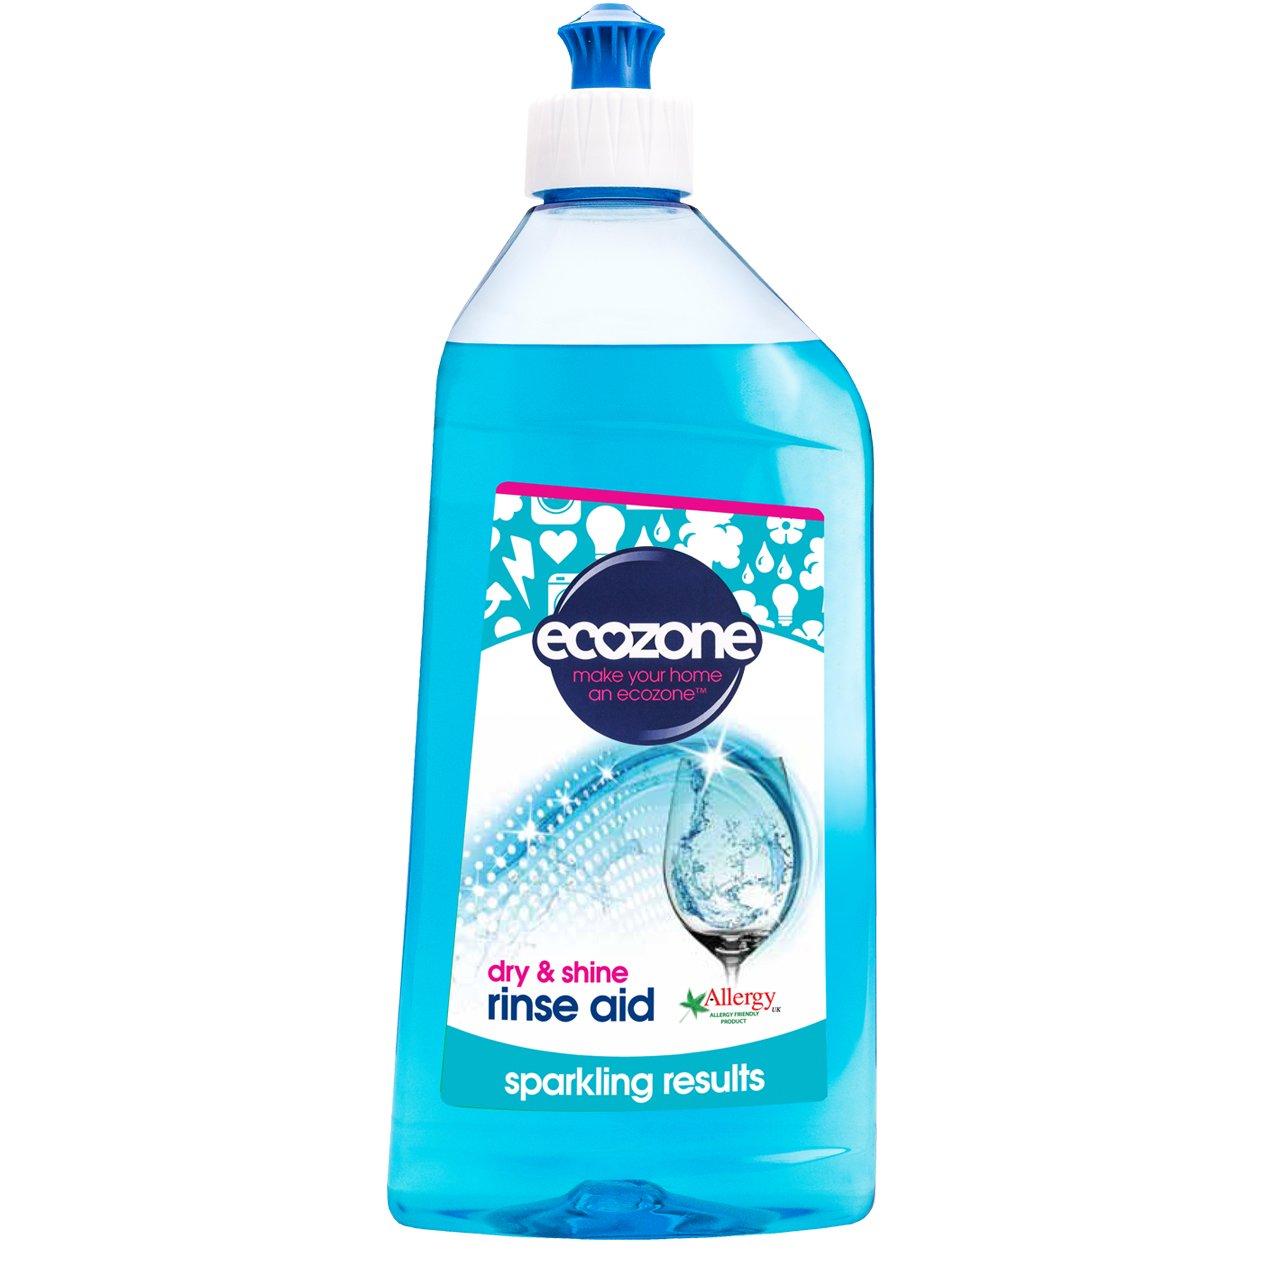 (4 PACK) - Ecozone Dishwasher Rinse Aid | 500ml | 4 PACK - SUPER SAVER - SAVE MONEY